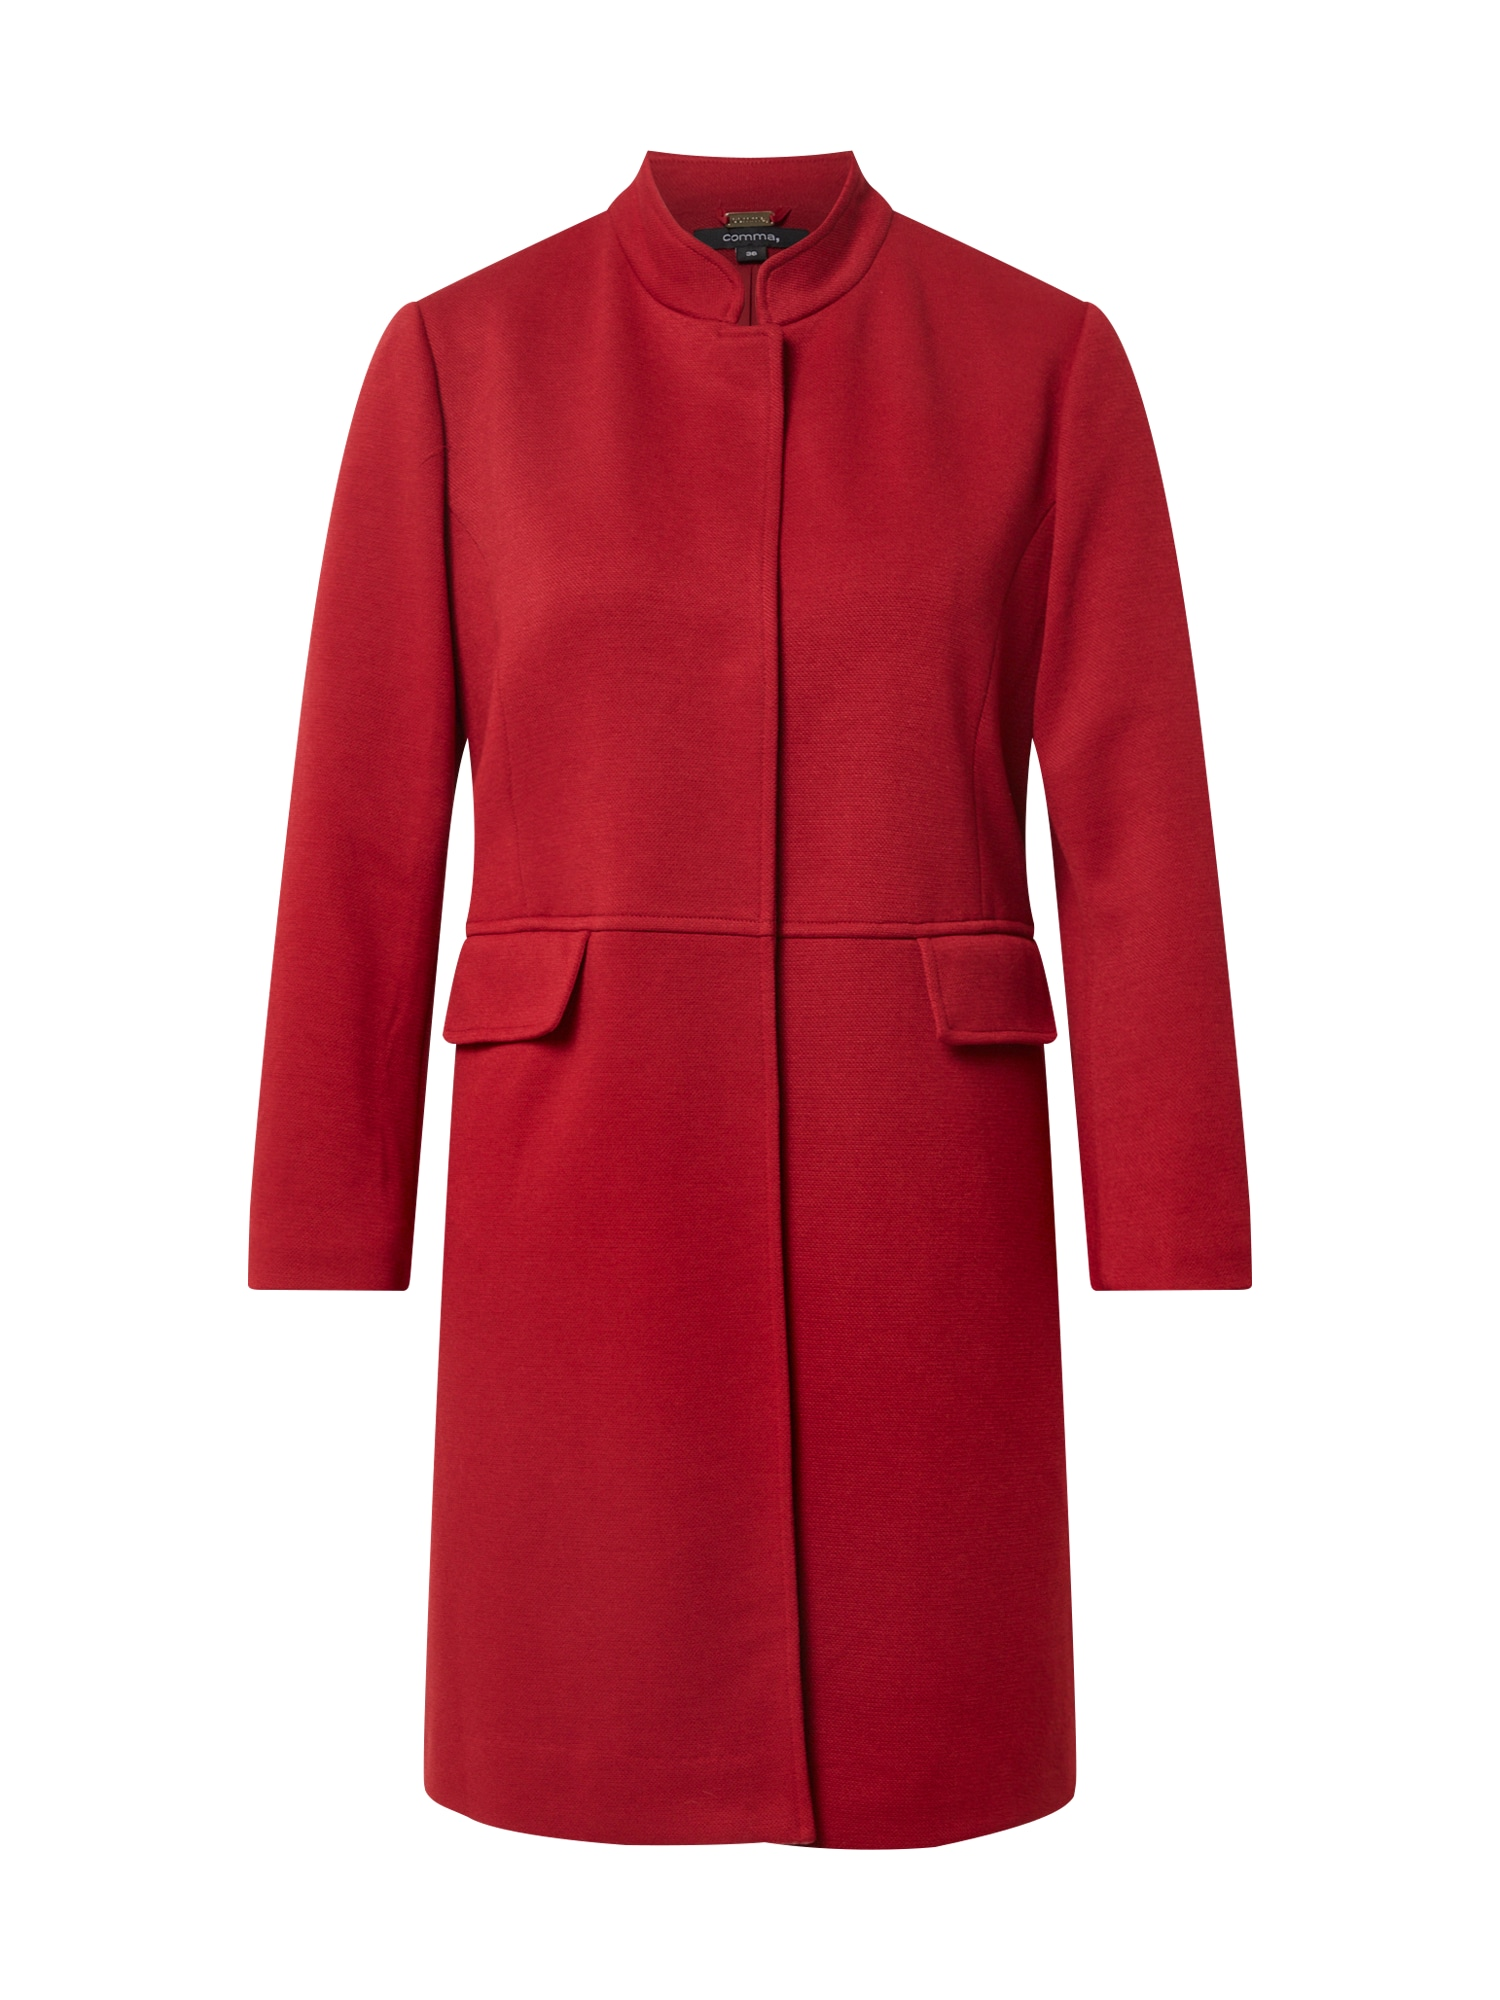 COMMA Demisezoninis paltas tamsiai raudona